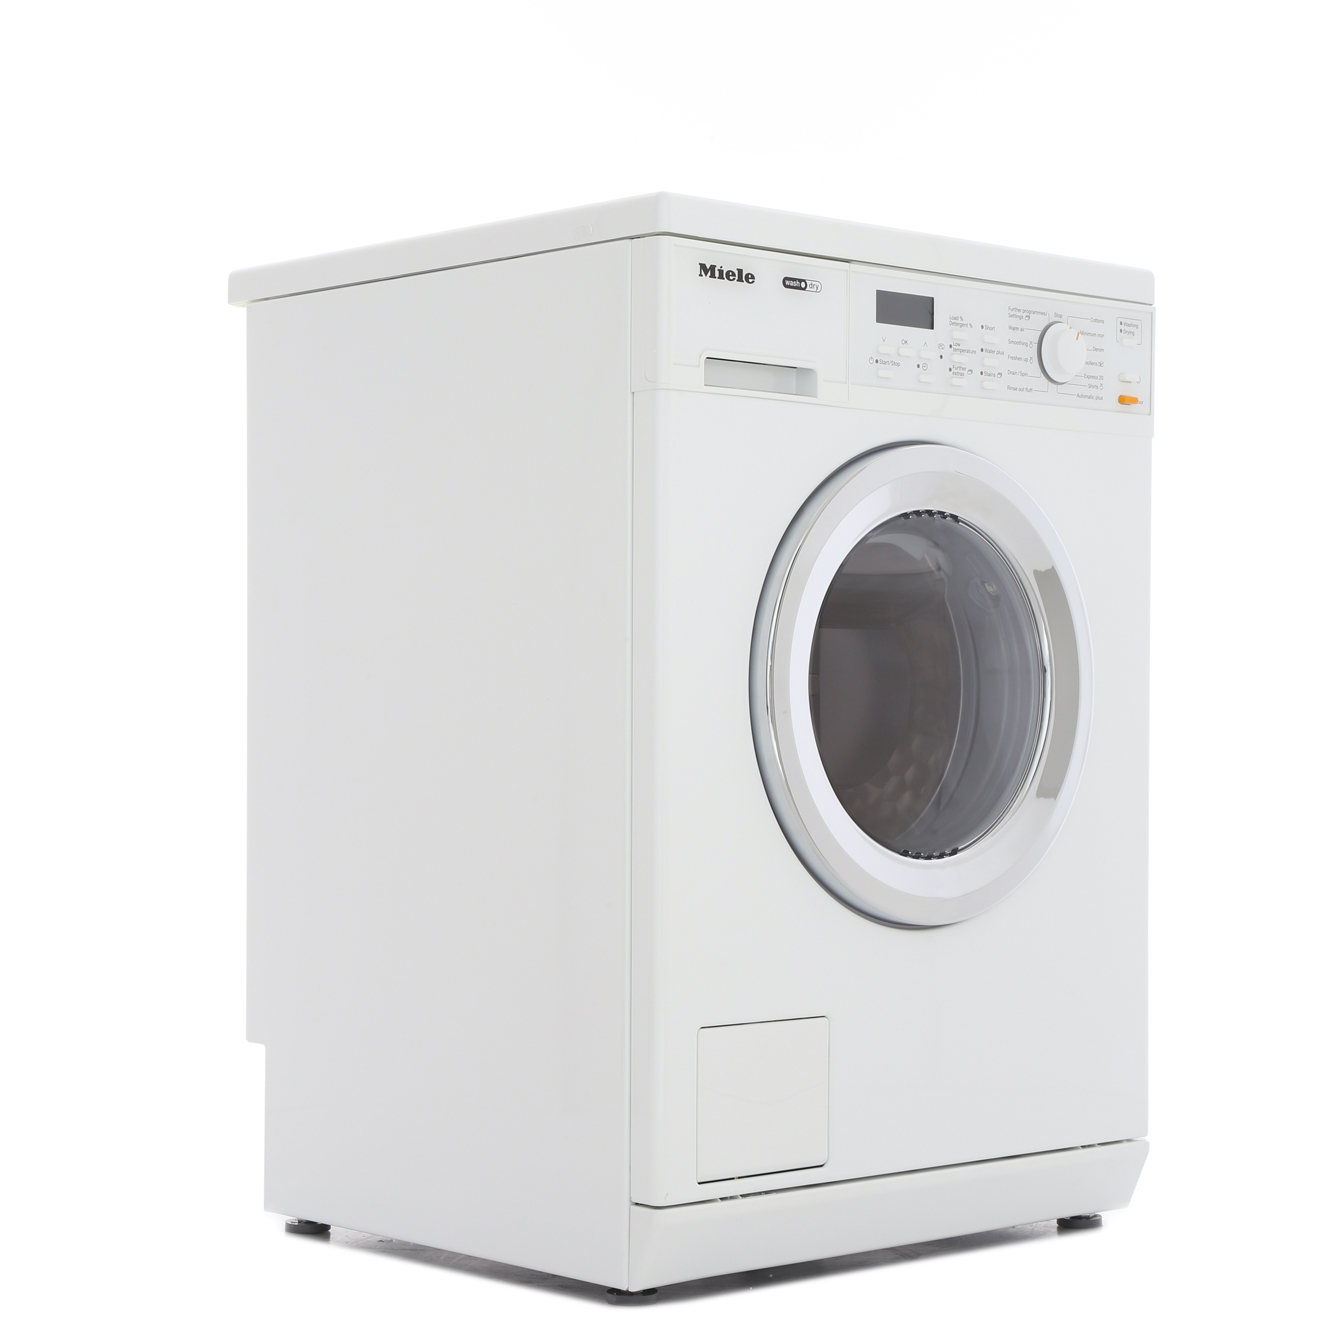 miele washer miele washerdryer combothe best washer. Black Bedroom Furniture Sets. Home Design Ideas